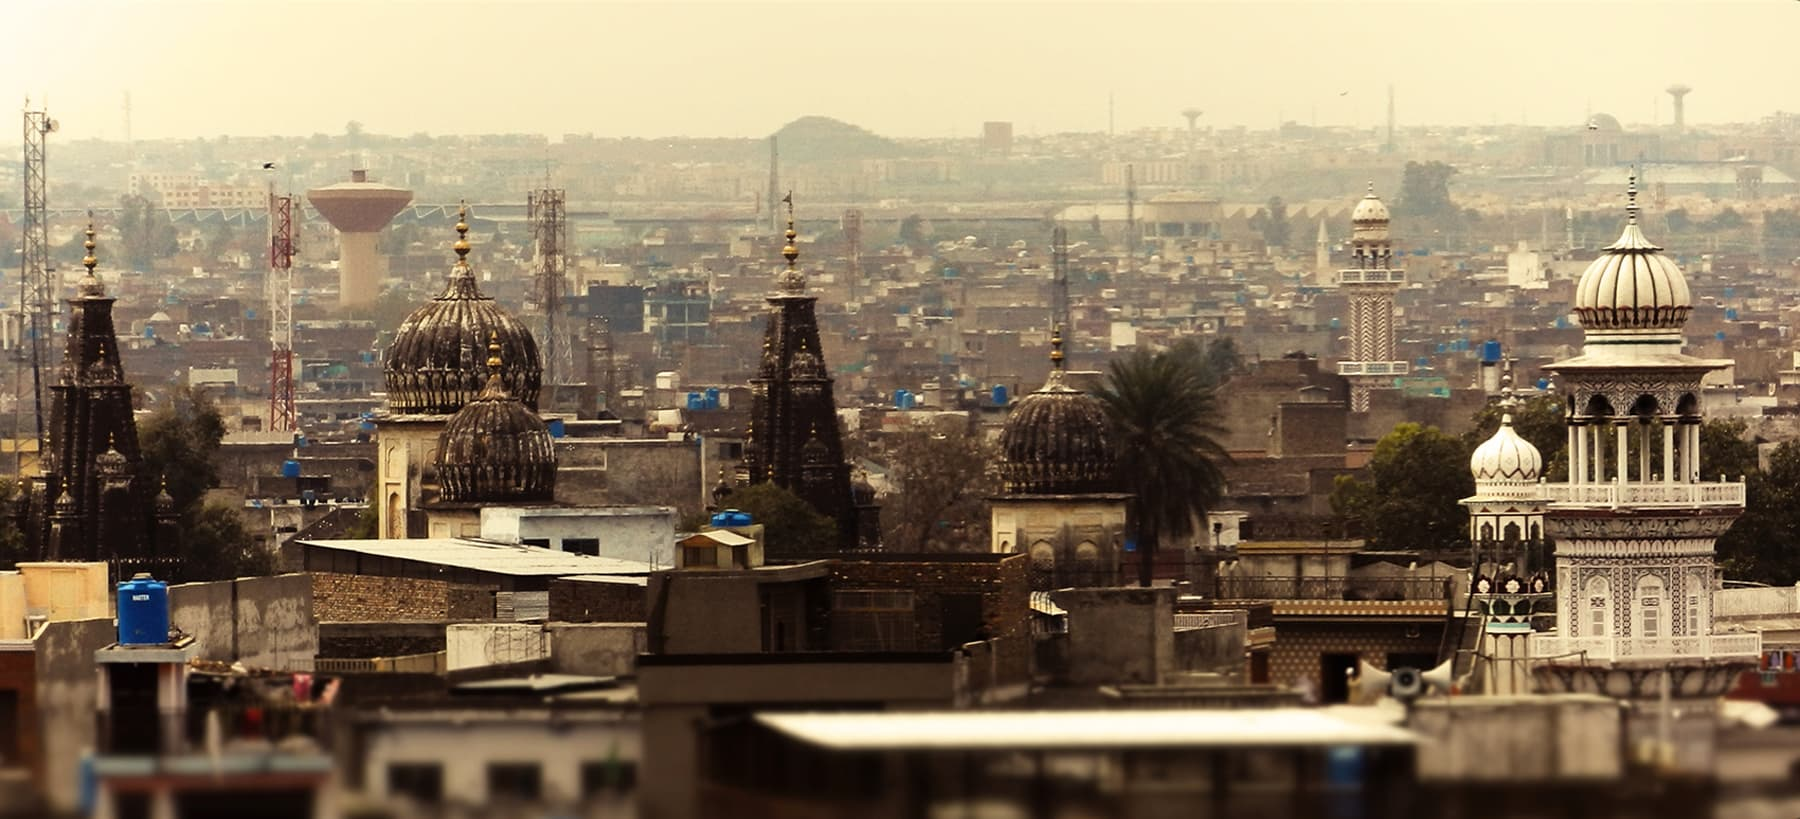 Bagh Sardaran Mandir as seen from Sujan Singh Haveli. —Muhammad Bin Naveed